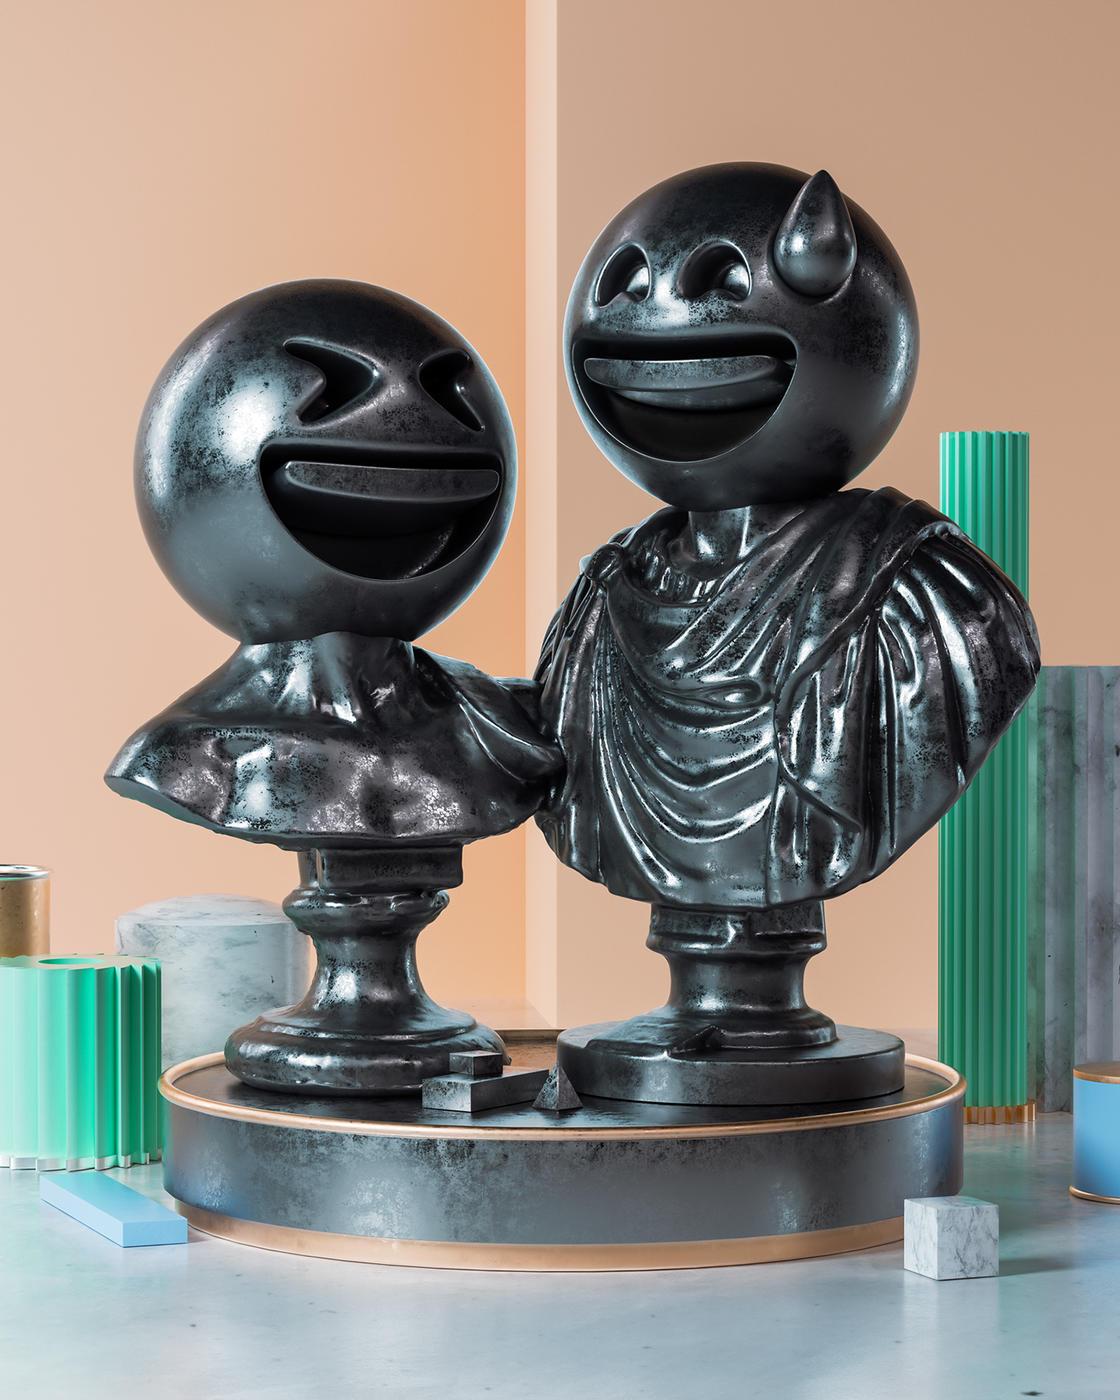 Sculptmojis – When emojis meet classical sculpture